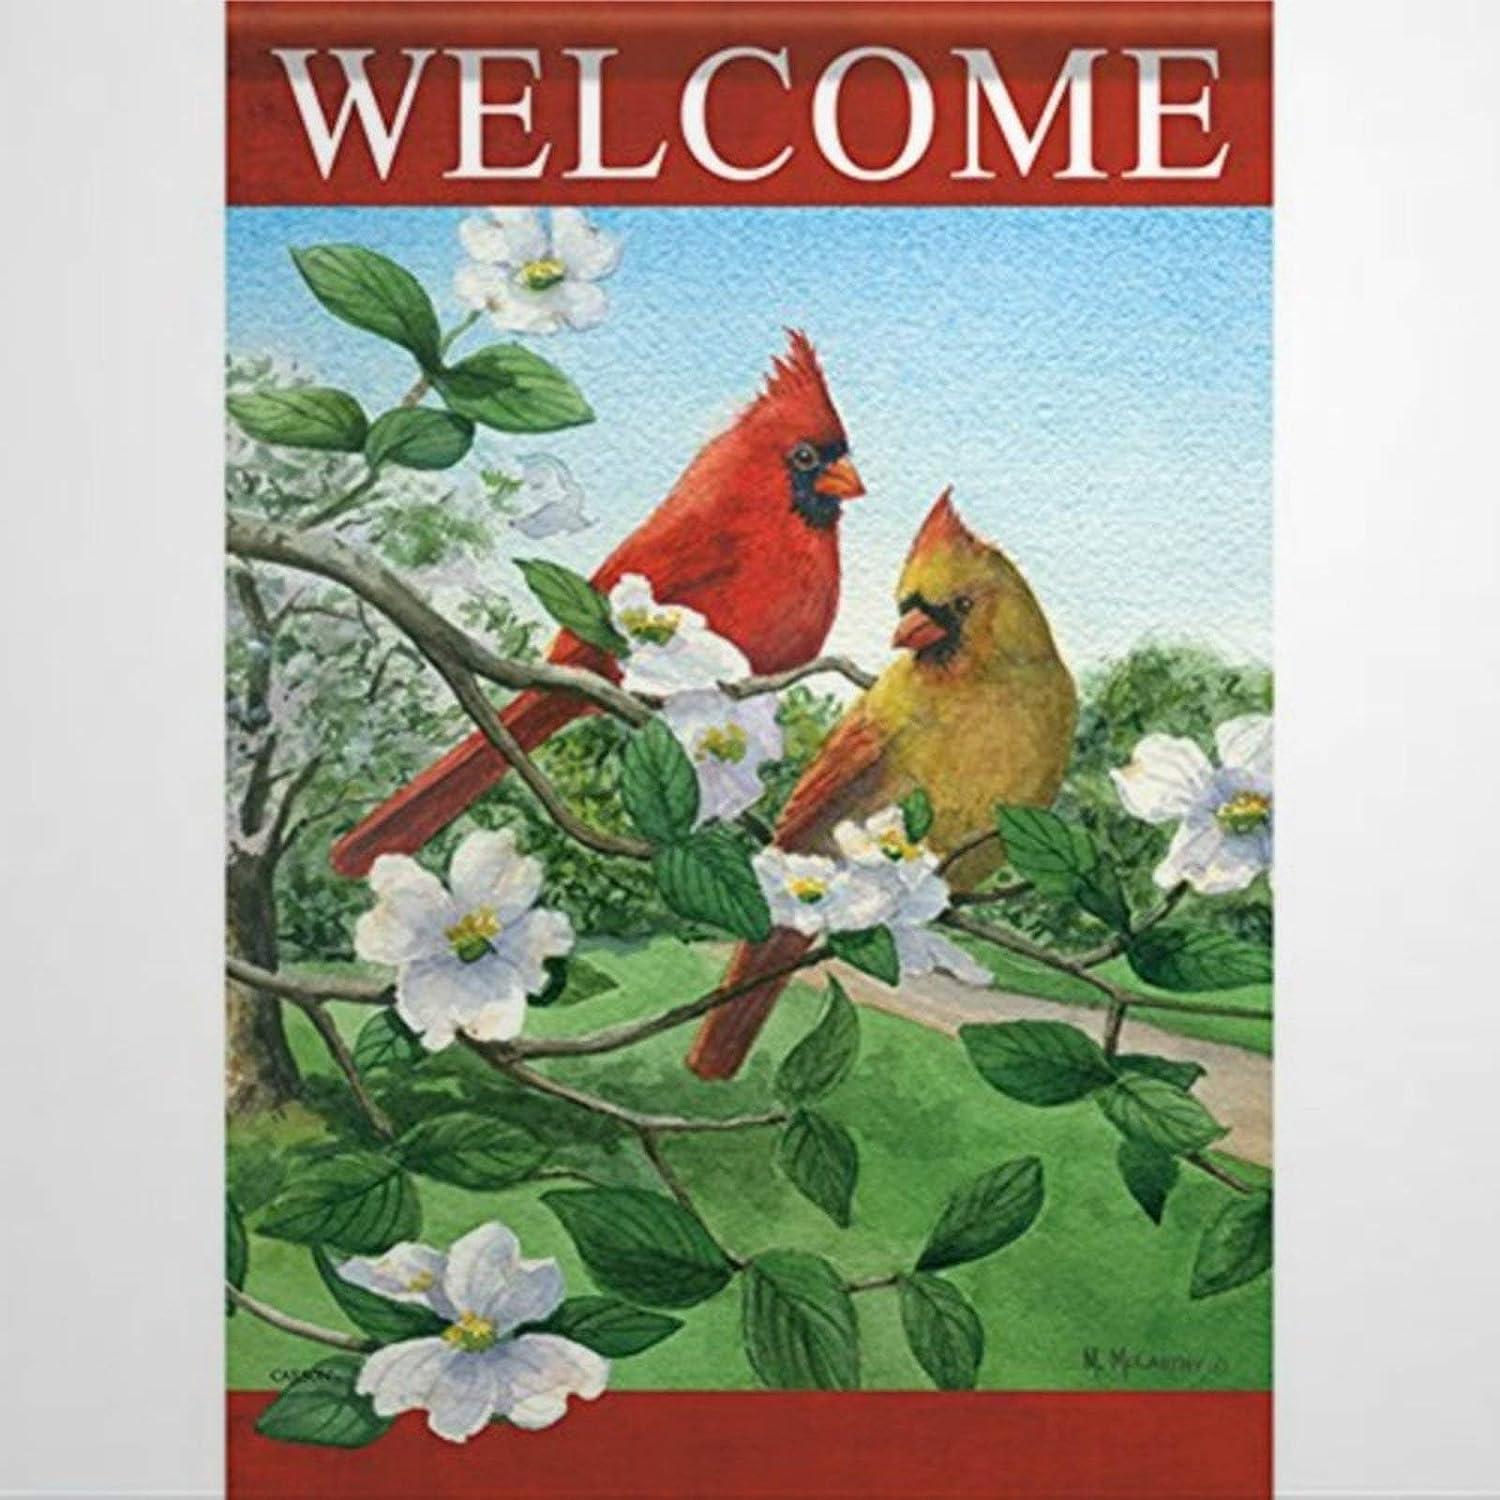 BYRON HOYLE Welcome Cardinals on Dogwood Garden Flag Decorative Holiday Seasonal Outdoor Weather Resistant Double Sided Print Farmhouse Flag Yard Patio Lawn Garden Decoration 12 x 18 Inch475154